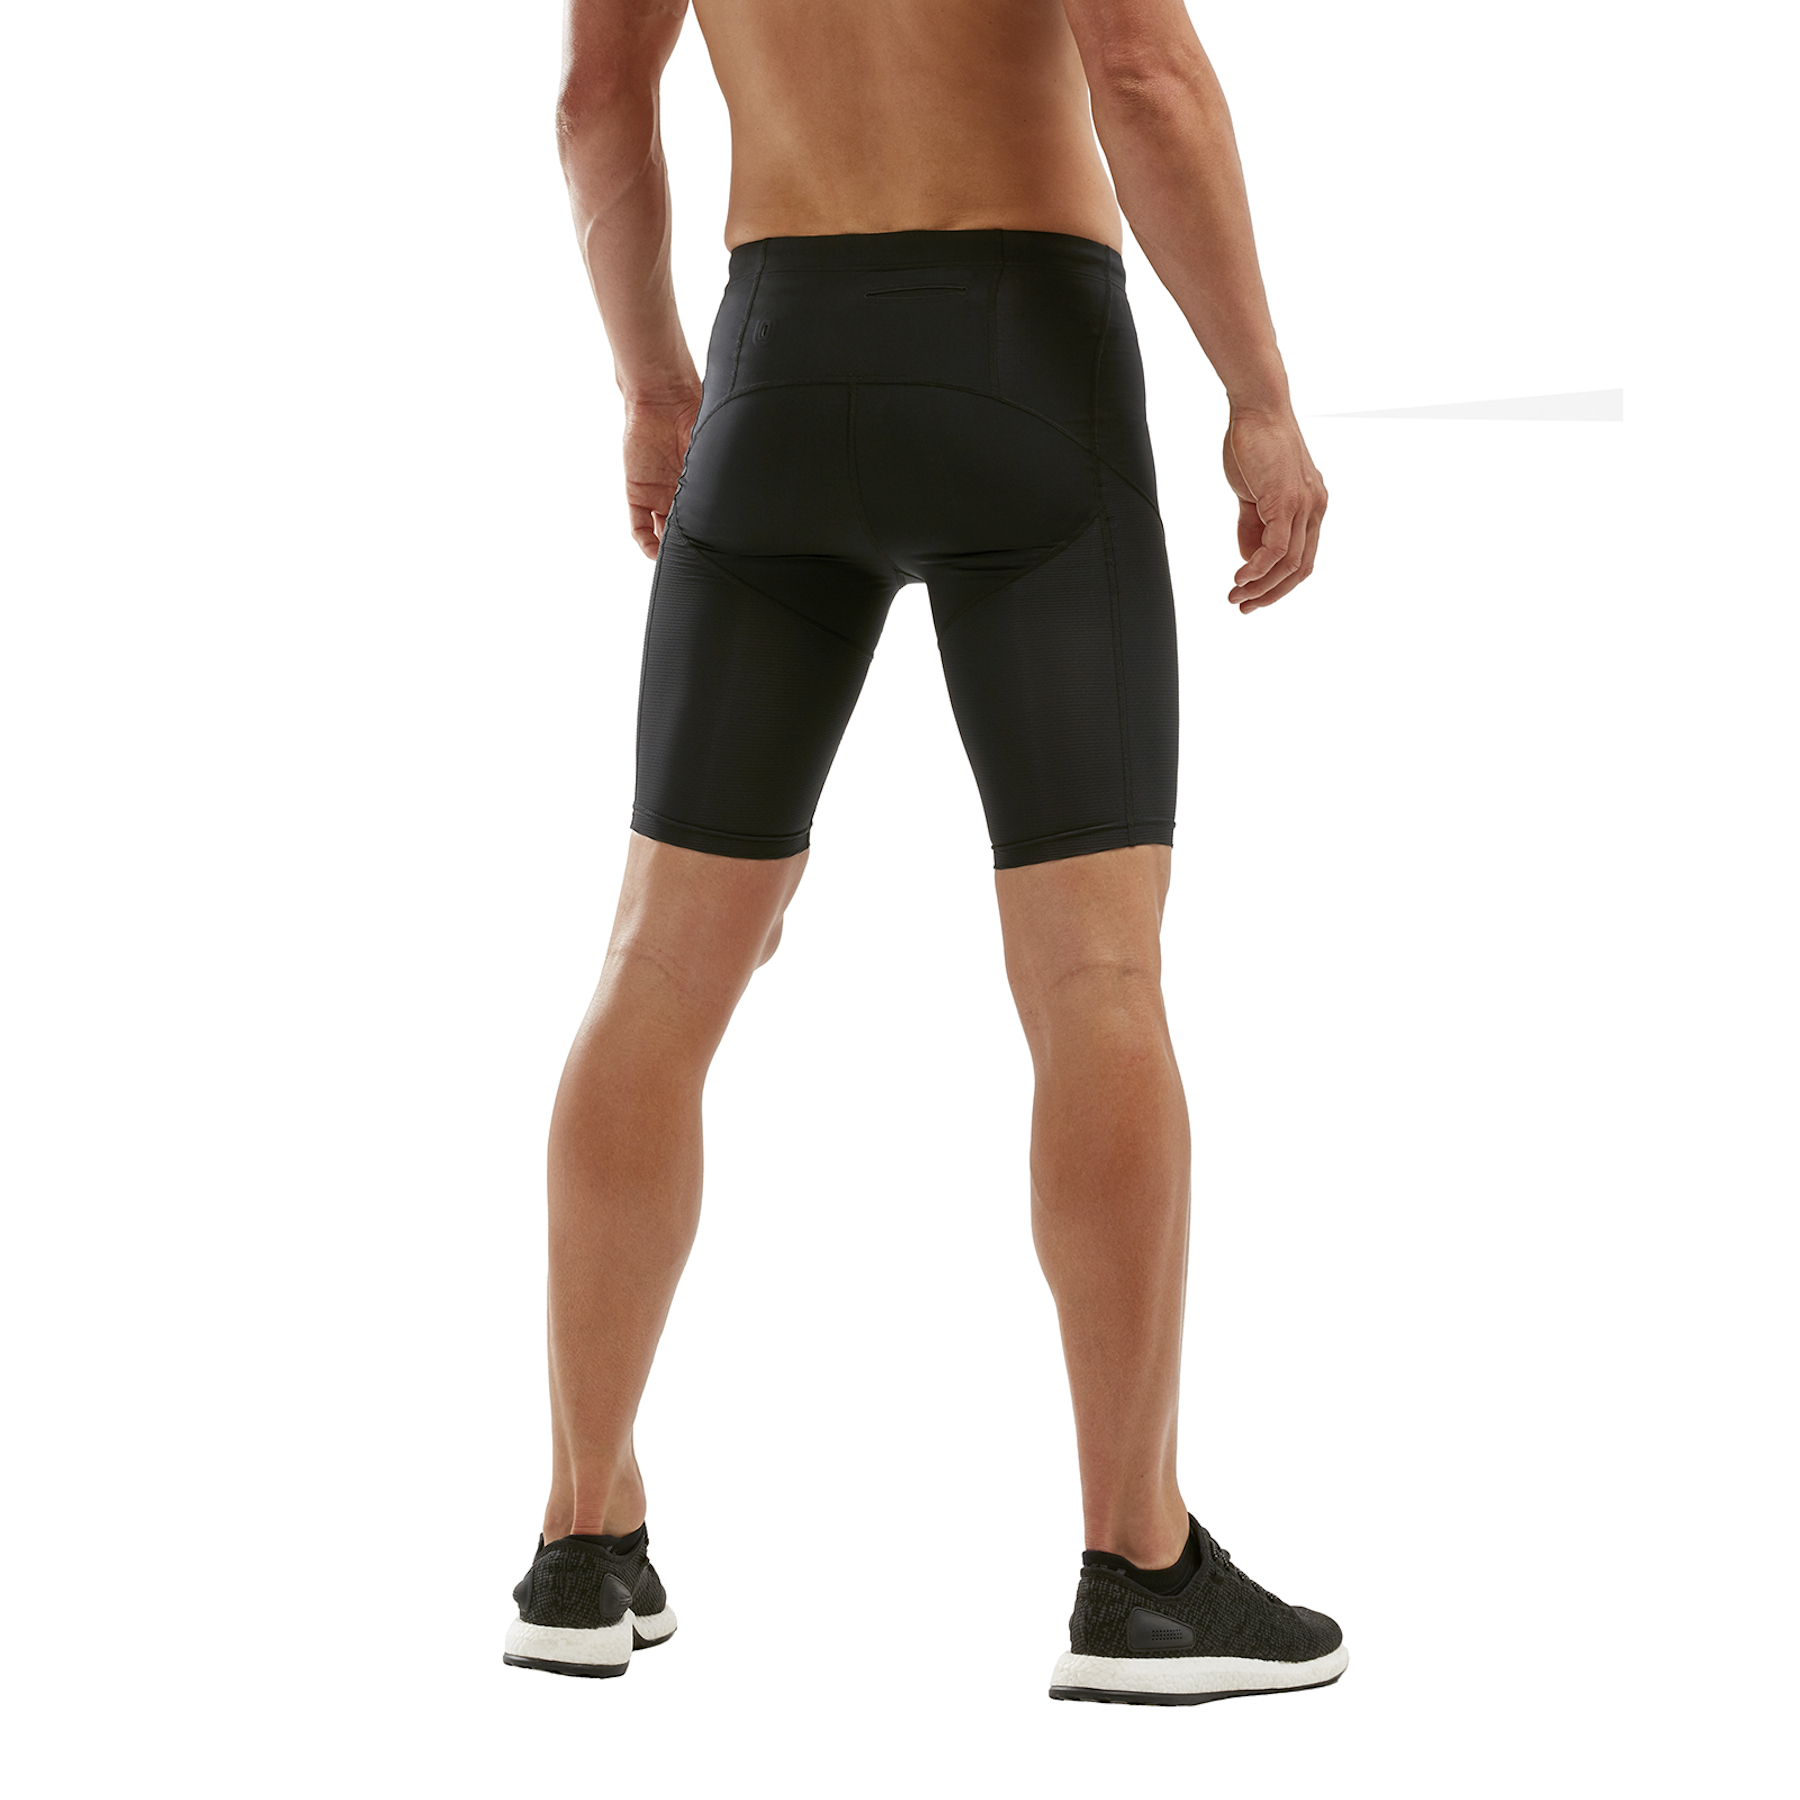 Imagen de 2XU Run Dash Compression Shorts - black/denim reflective